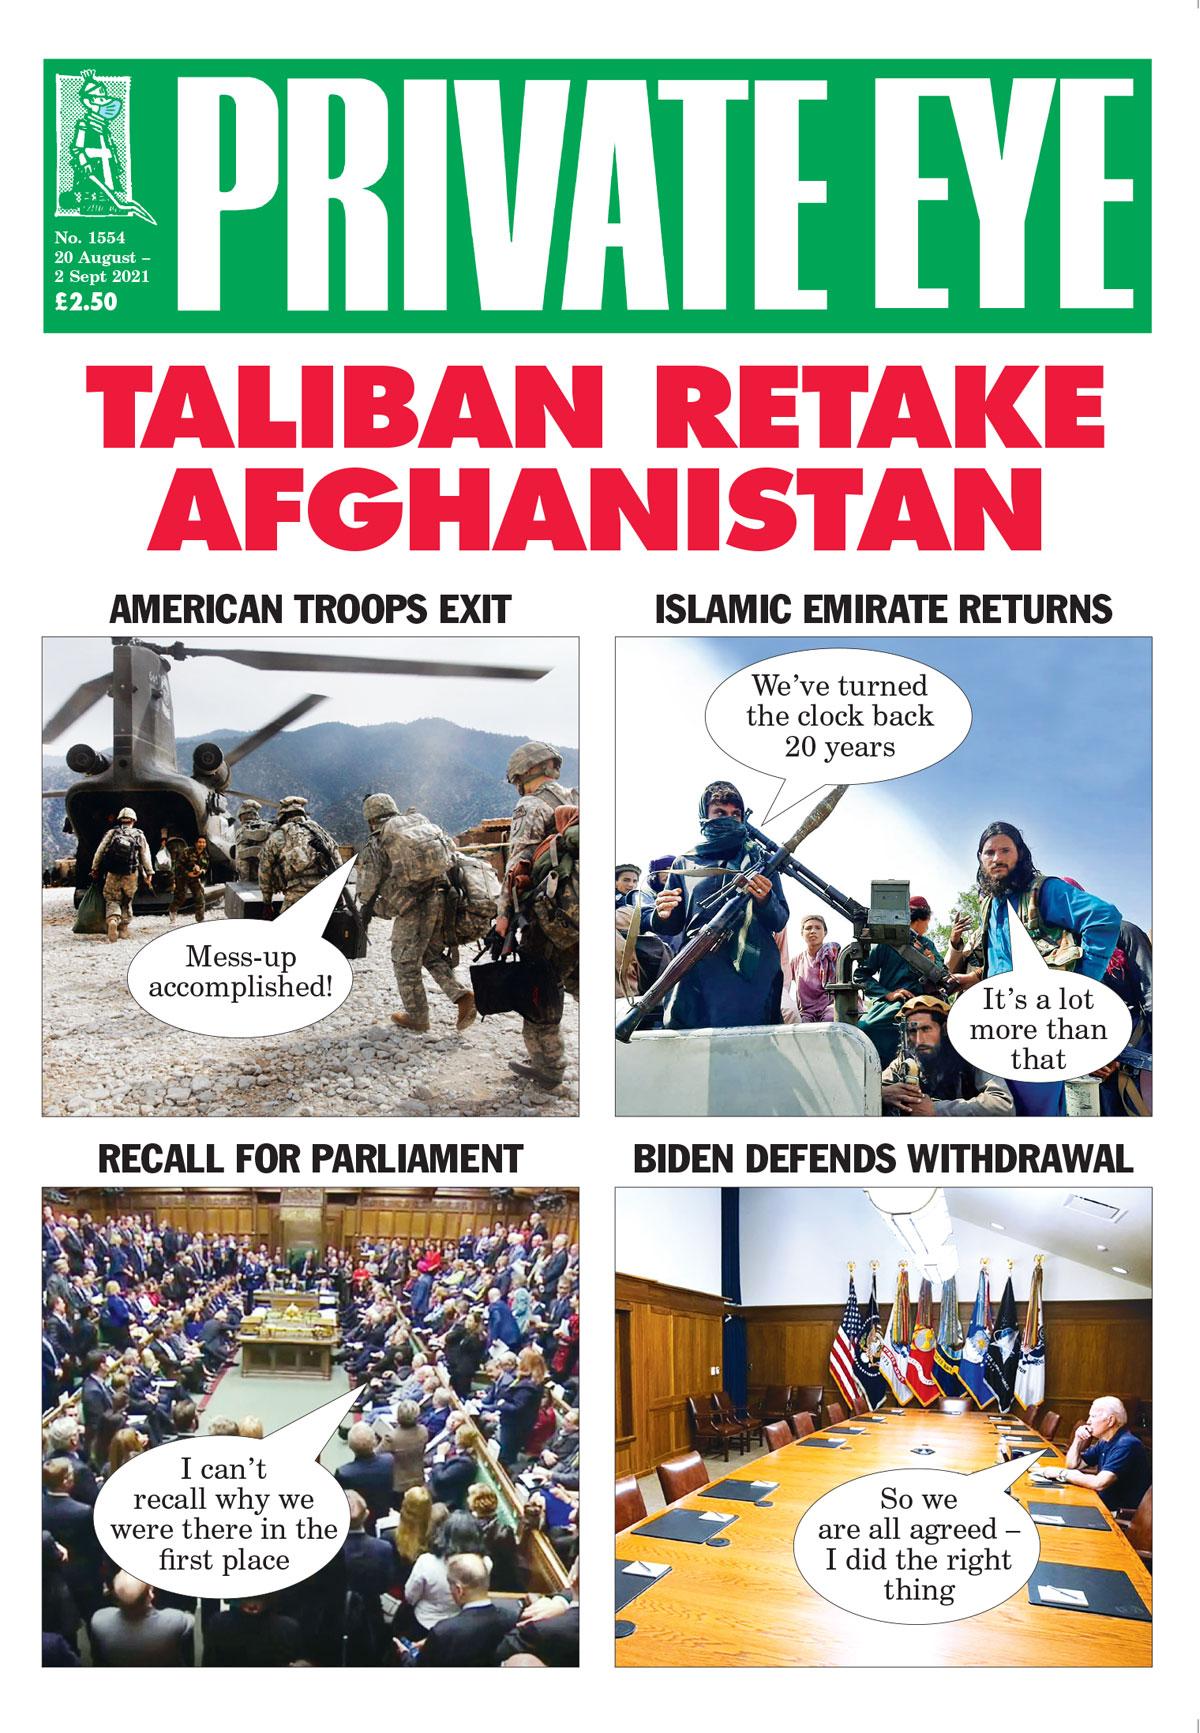 The Taliban Joe Biden Parliament Army Soldiers